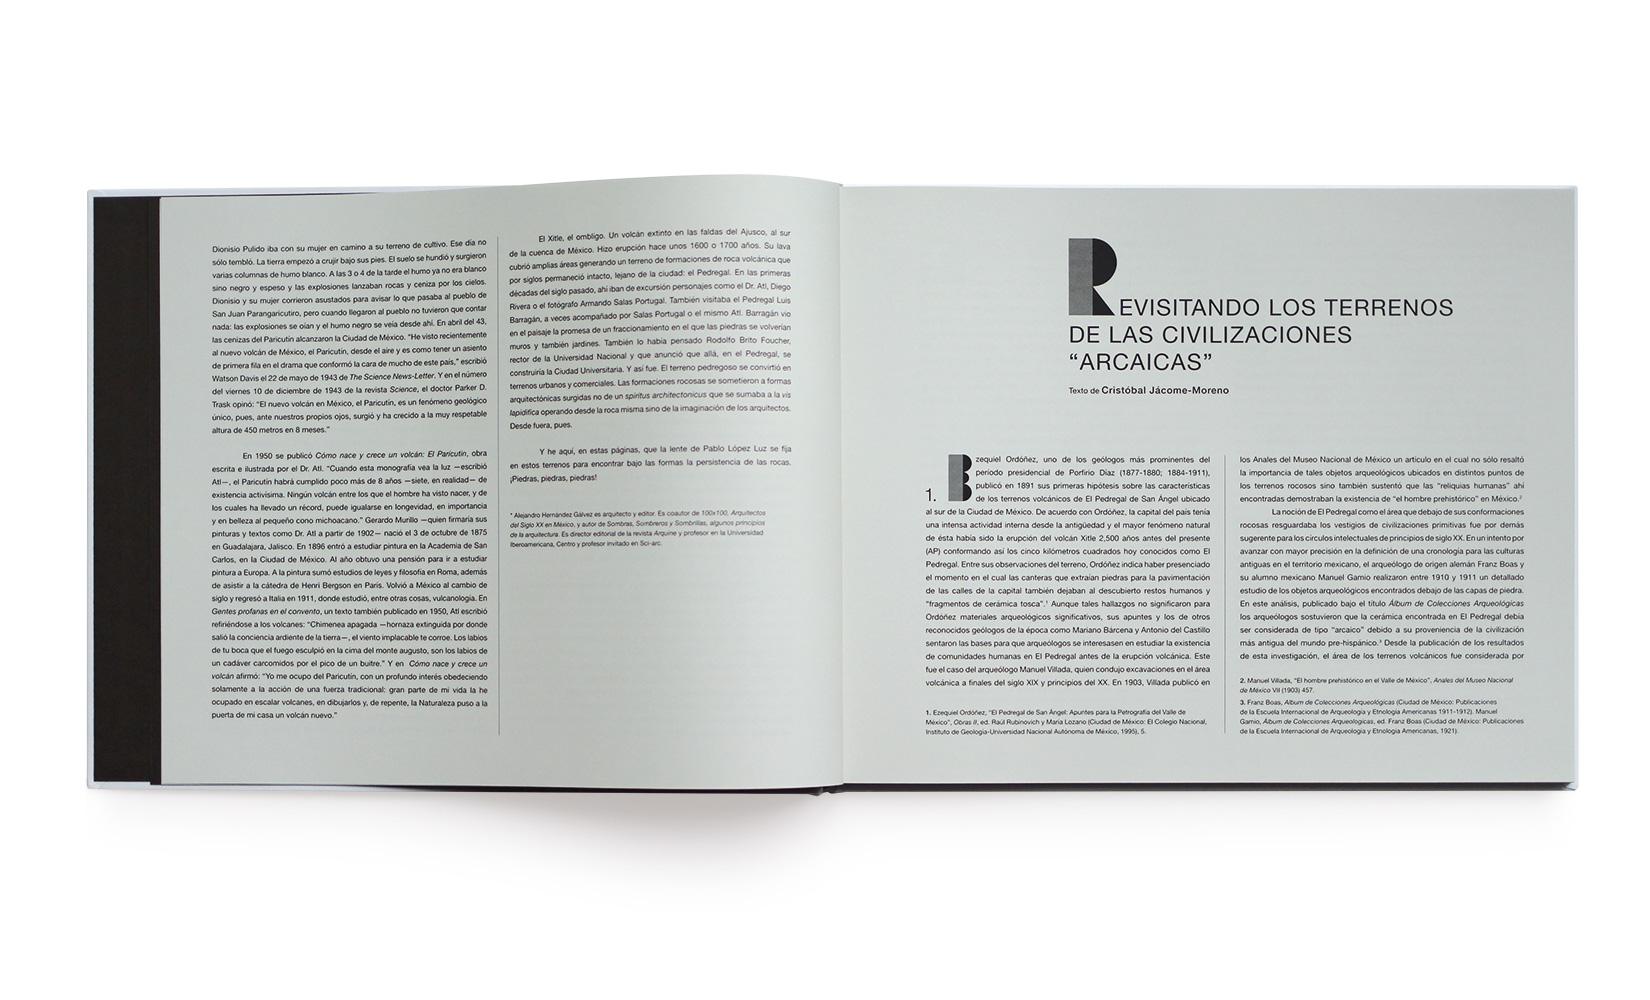 PIEDRA-VOLCANICA-PABLO-LOPEZ-LUZ-TOLUCA-STUDIO-03.jpg